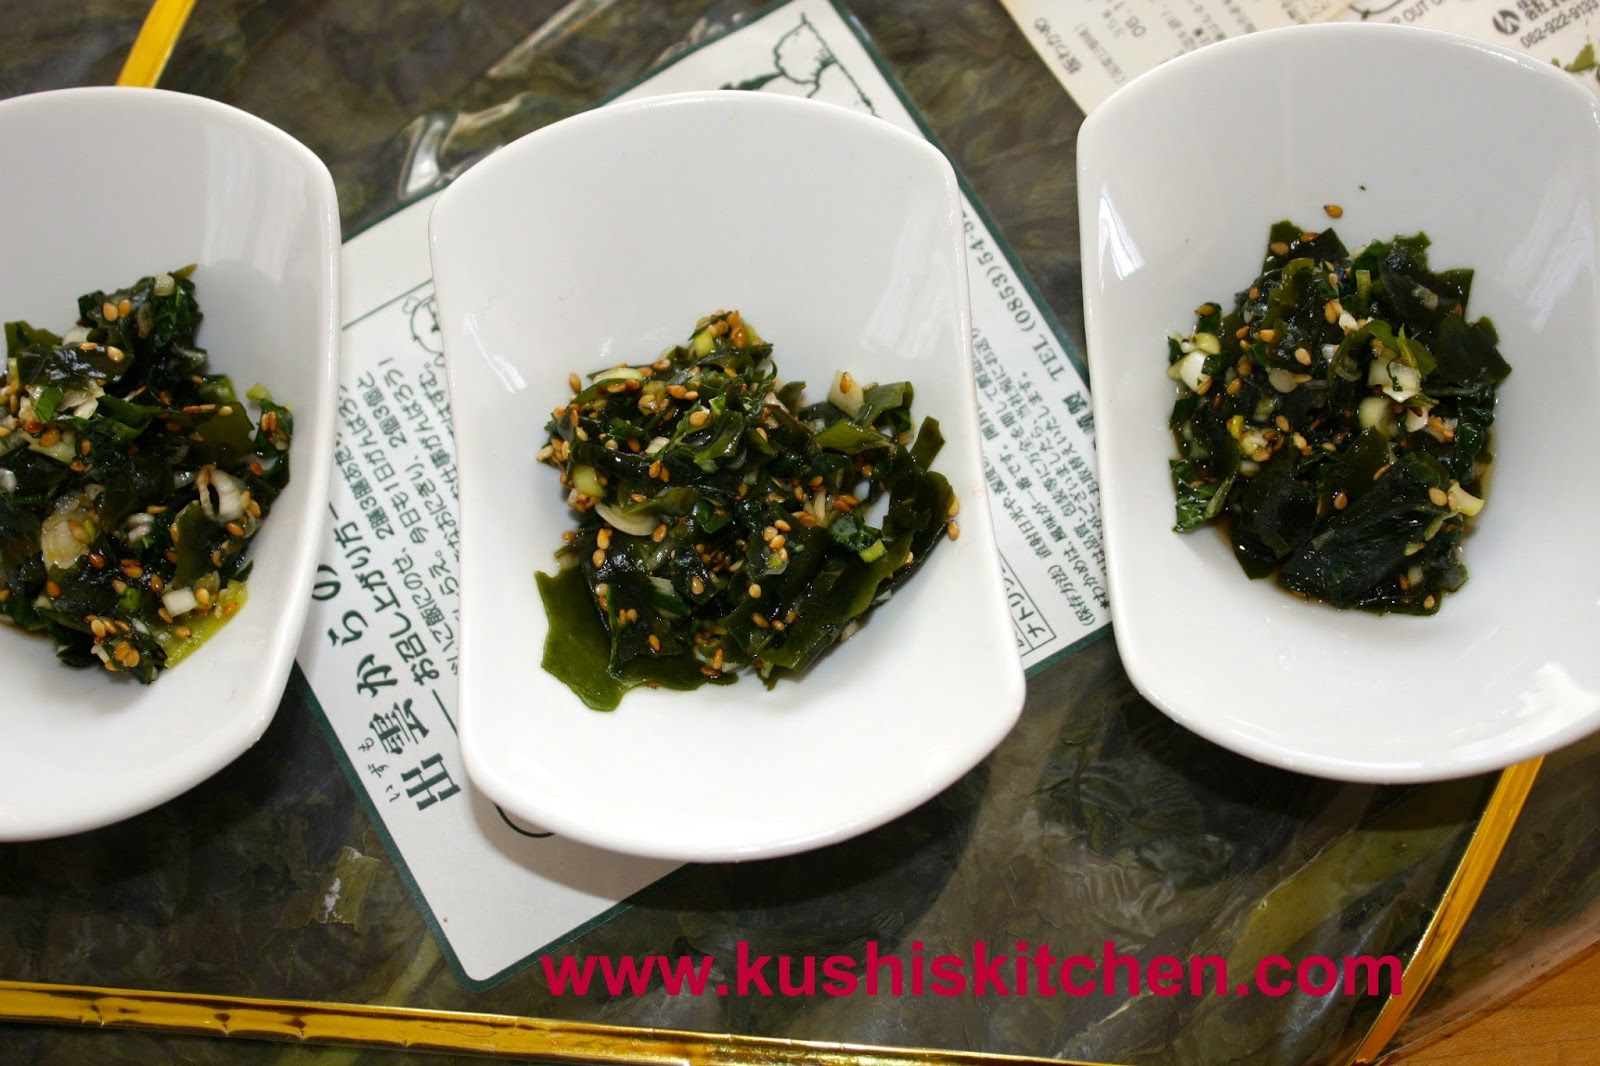 Kushi's Kitchen Blog